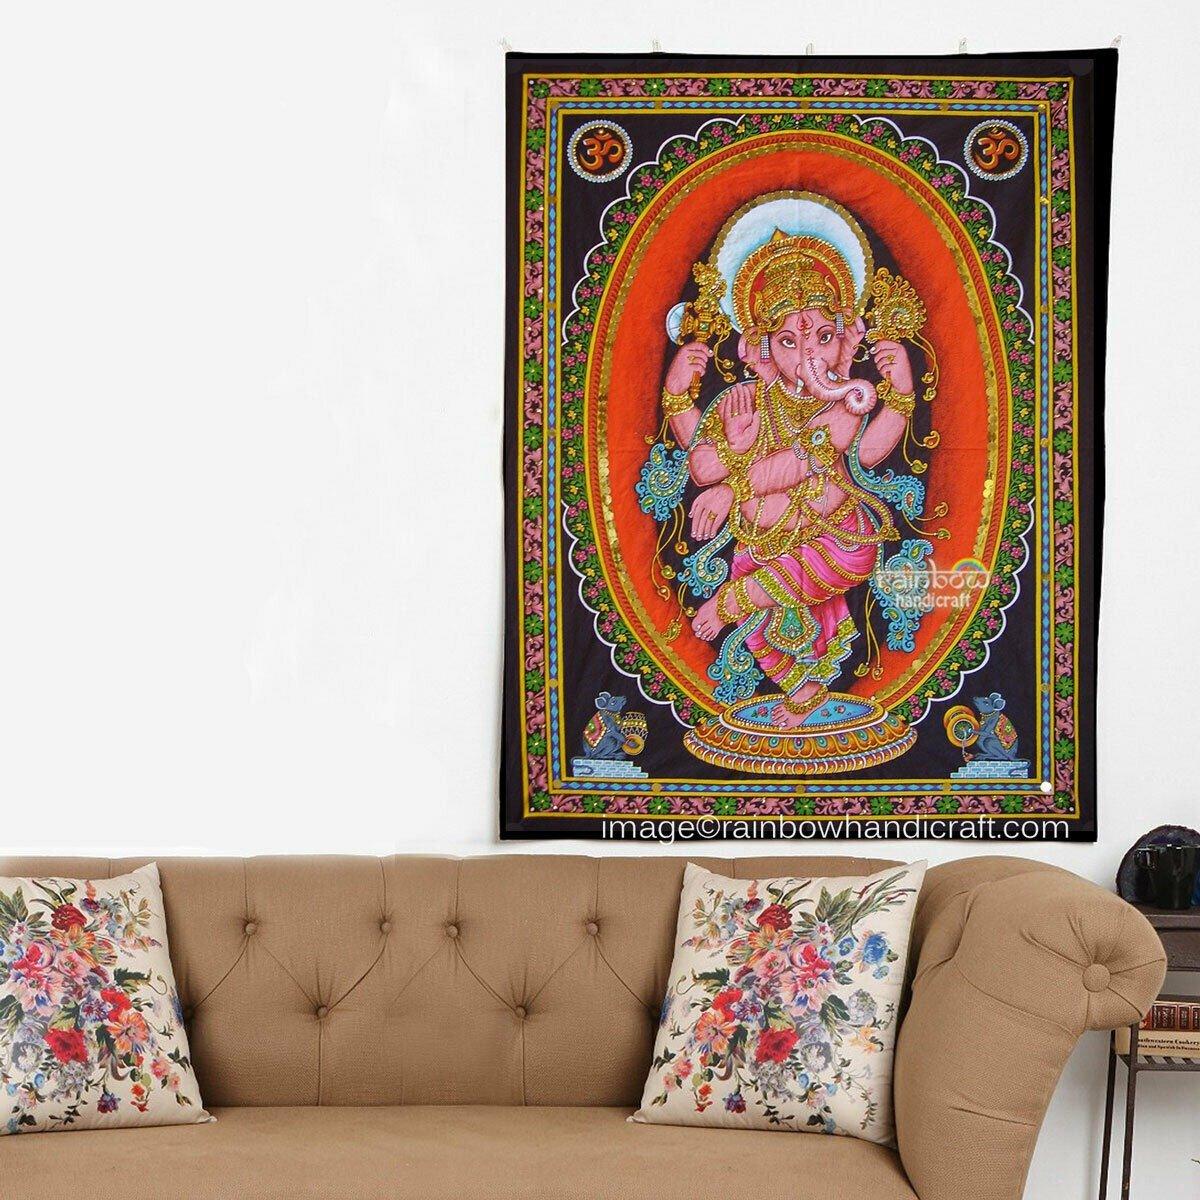 hindu deity elephant god dancing Ganesha ganesh sequin wall hanging tapestry decor art